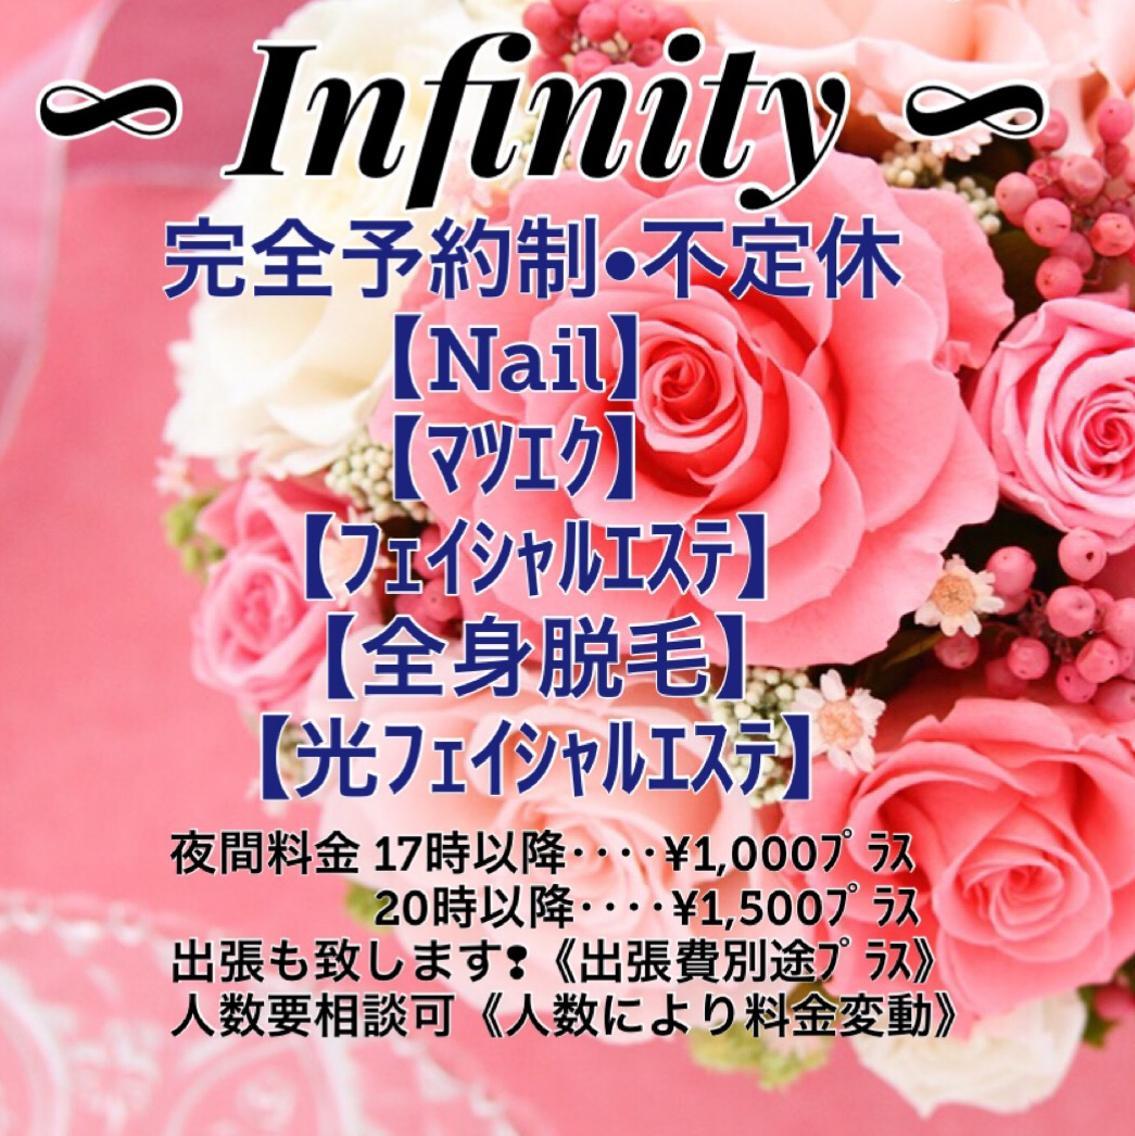 Nail Salon♡TotalBeauty♡∞Infinity∞所属・平山生美の掲載